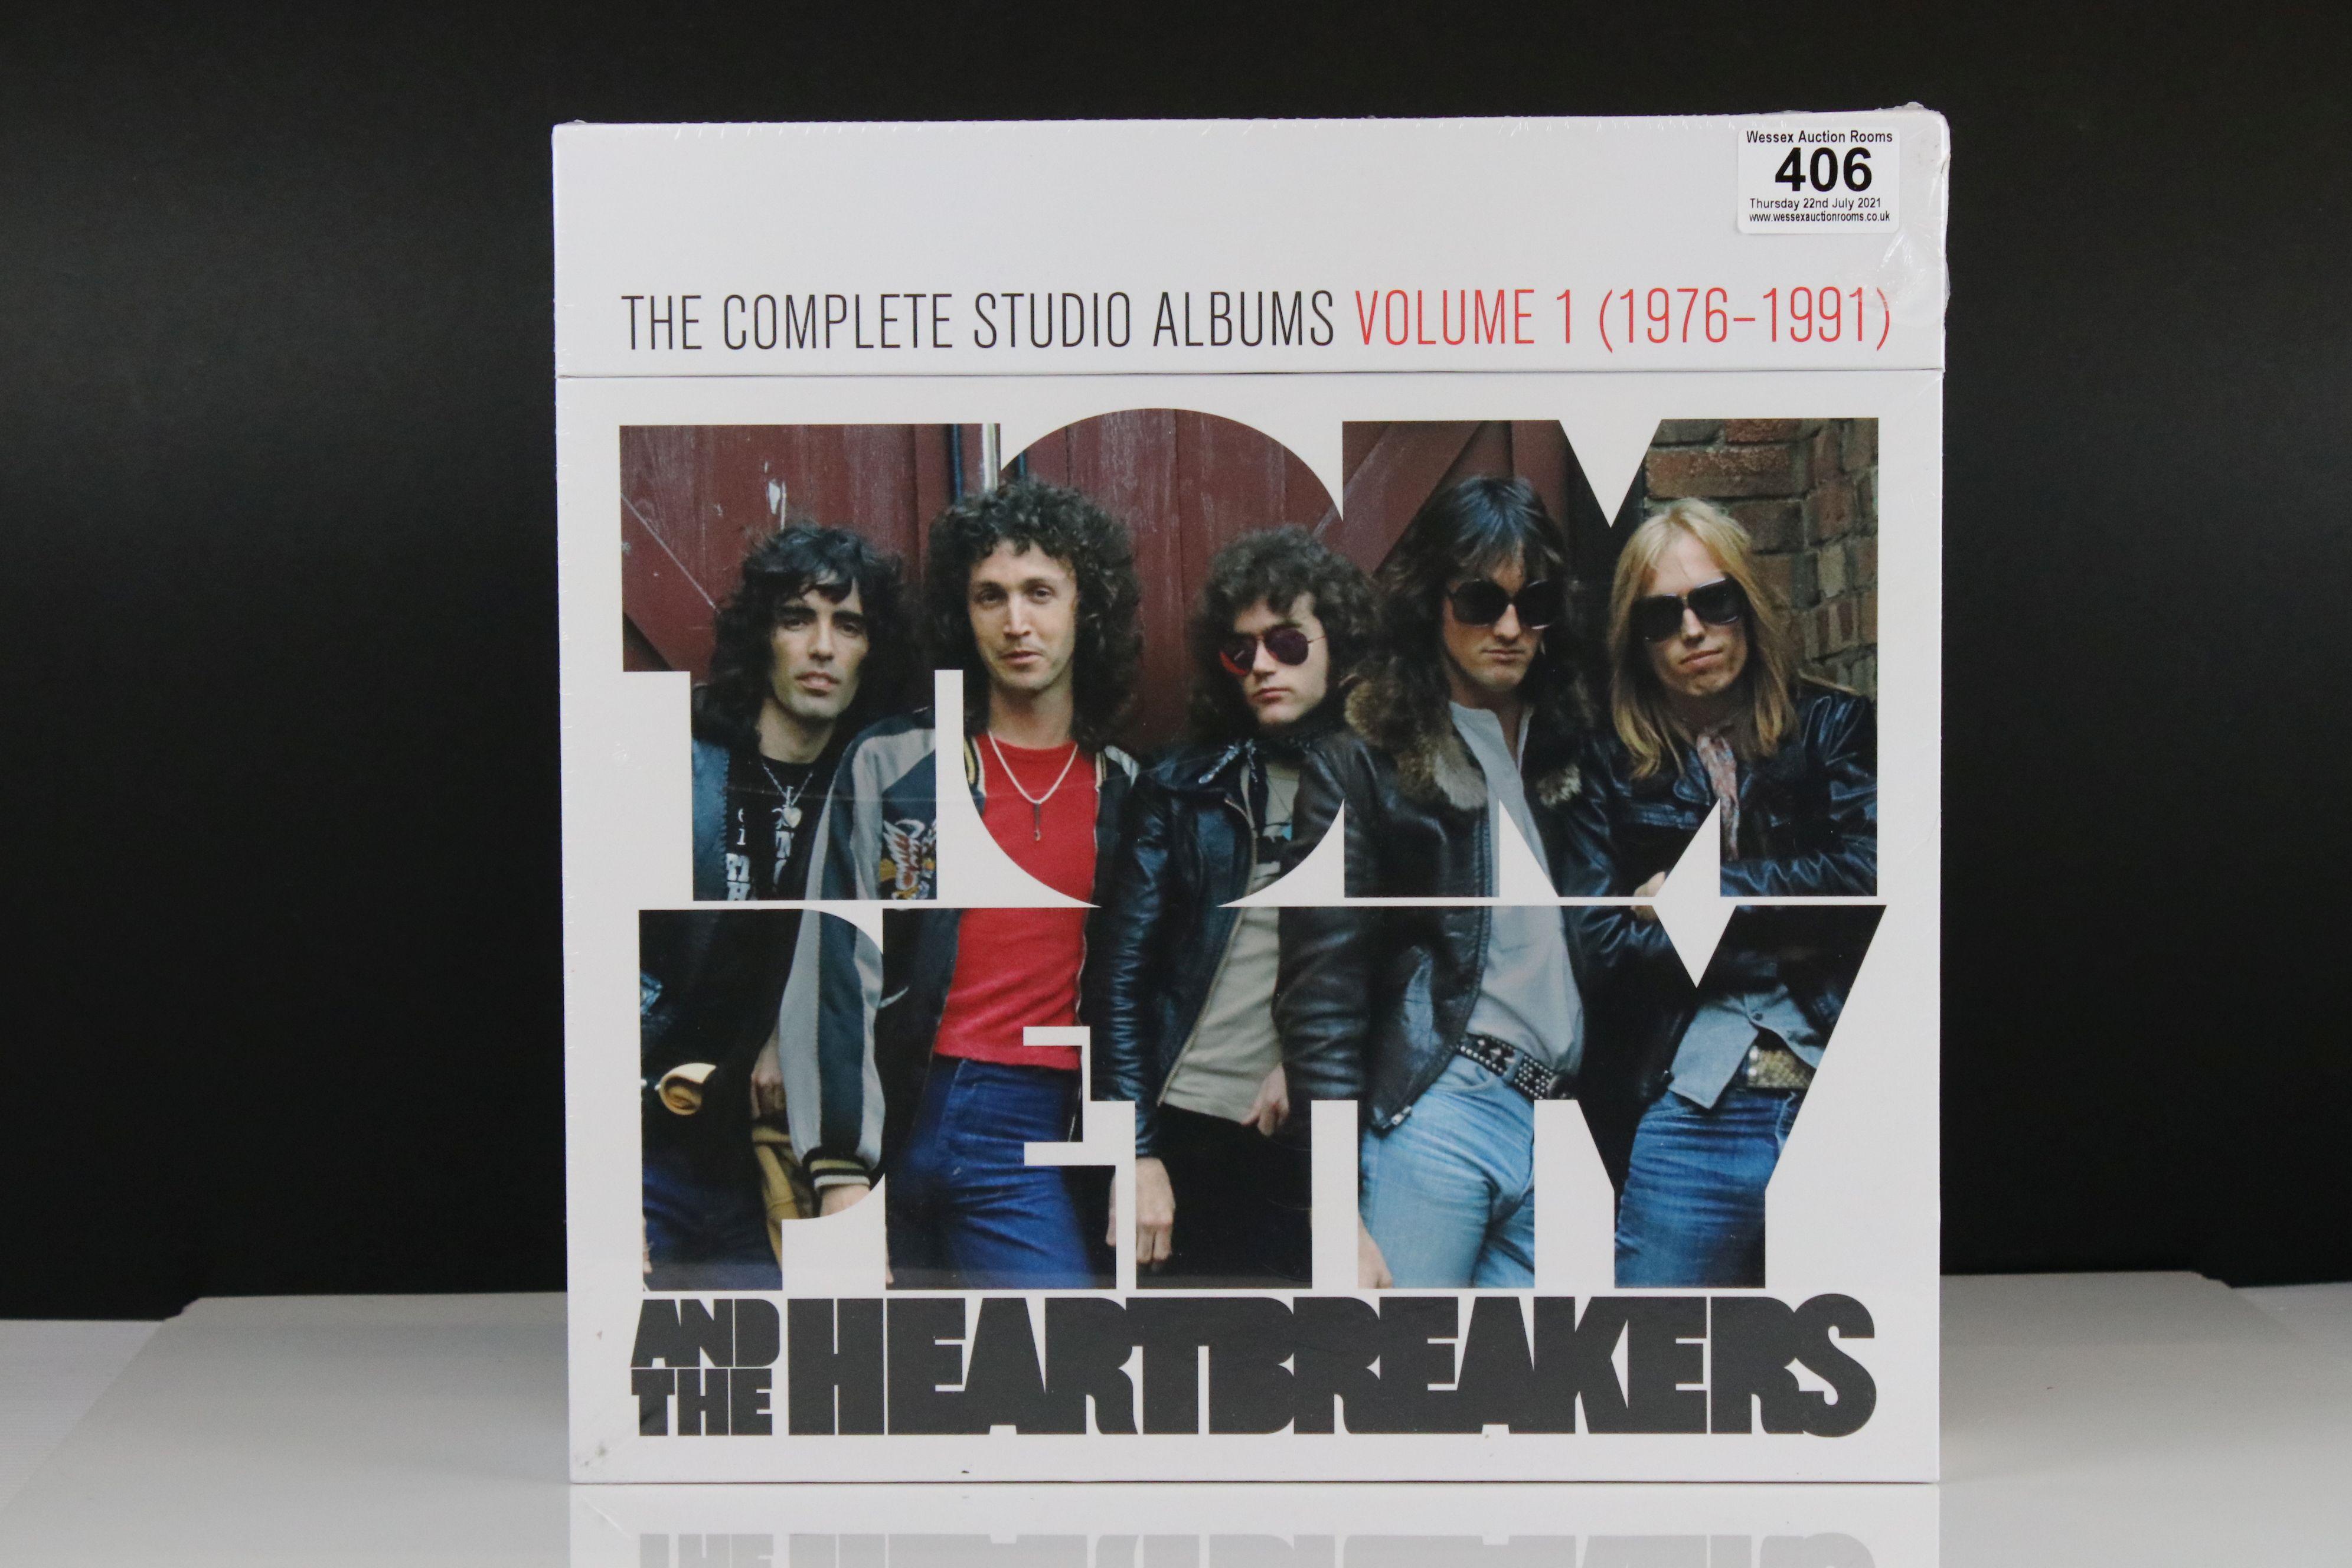 Vinyl - Tom Petty and The Heartbreakers Complete Studio Albums Volume 1 (1976-1991) Box Set, sealed